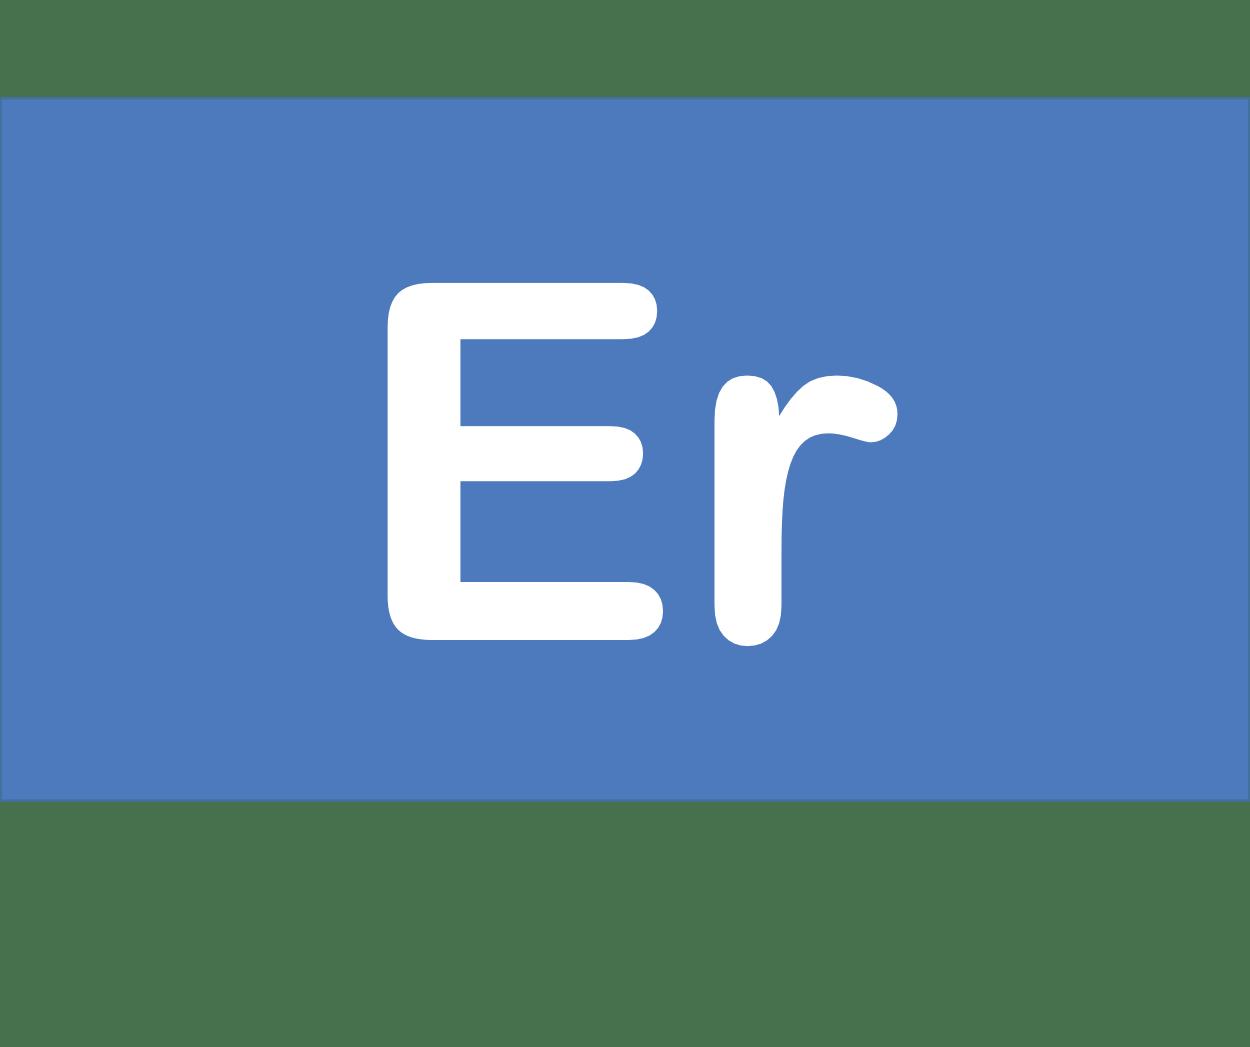 68 Er エルビウム Erbium 元素 記号 周期表 化学 原子